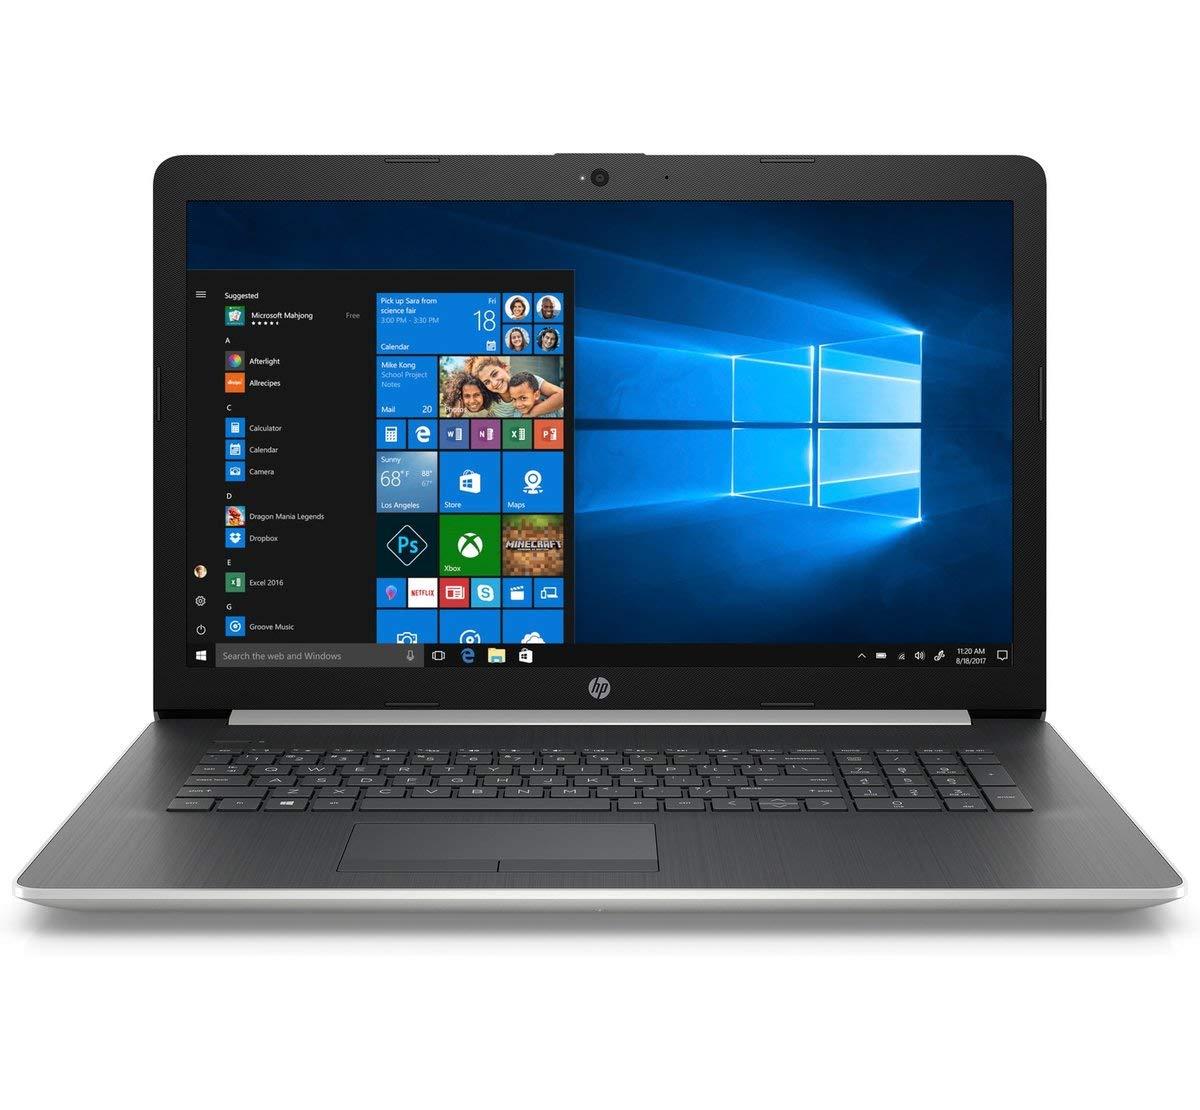 2019 HP 17.3″ HD+ Premium Laptop Computer, 8th Gen Intel Core i3-8130U(Beat I5-7200U) up to 3.40GHz, 8GB DDR4 RAM, 1TB HDD, 802.11ac WiFi, Bluetooth 4.2, USB 3.1, HDMI, DVDRW, Windows 10 Home